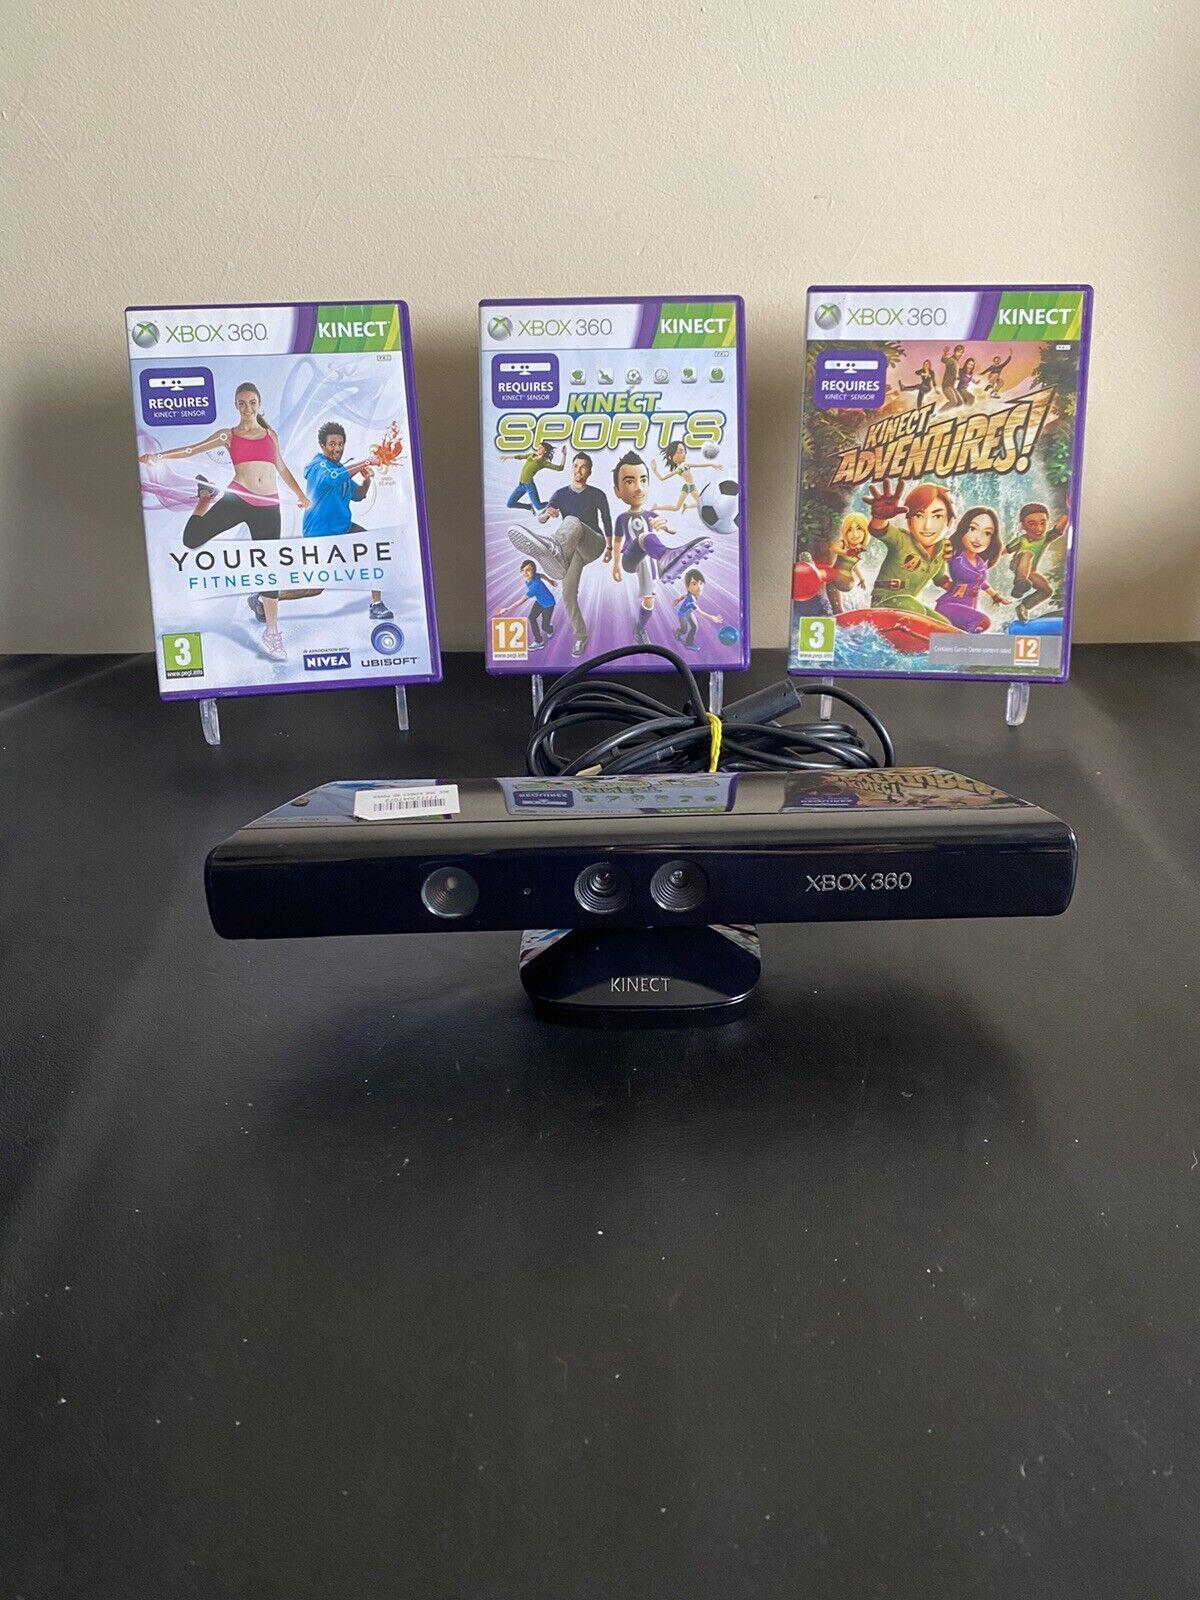 Xbox 360 Kinect Sensor + 3 Games Tested And Working